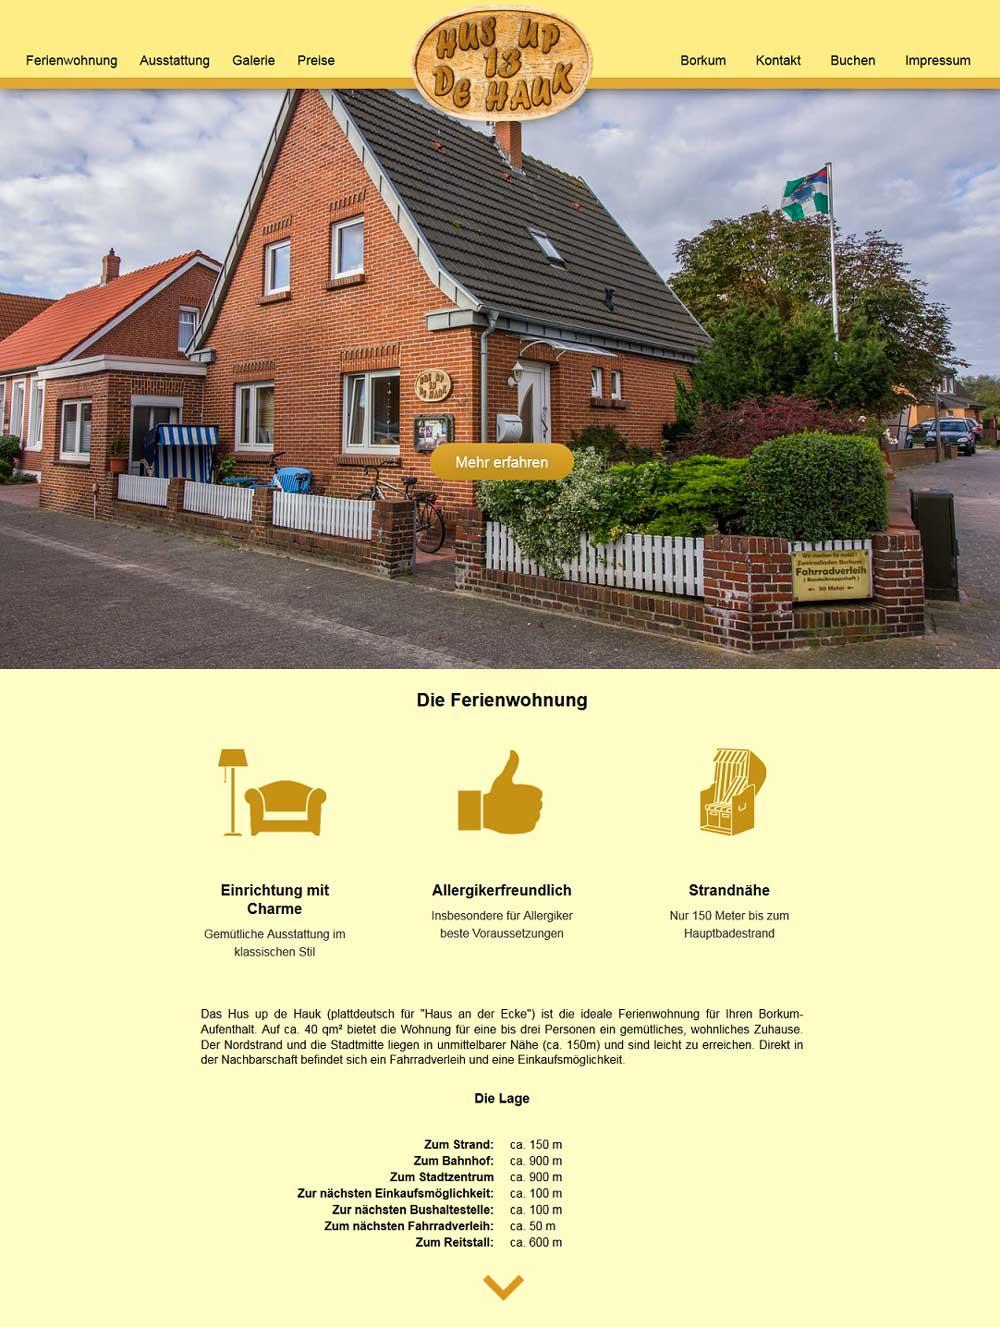 daniel koch - mediendesign | design-koch.de, Hause ideen